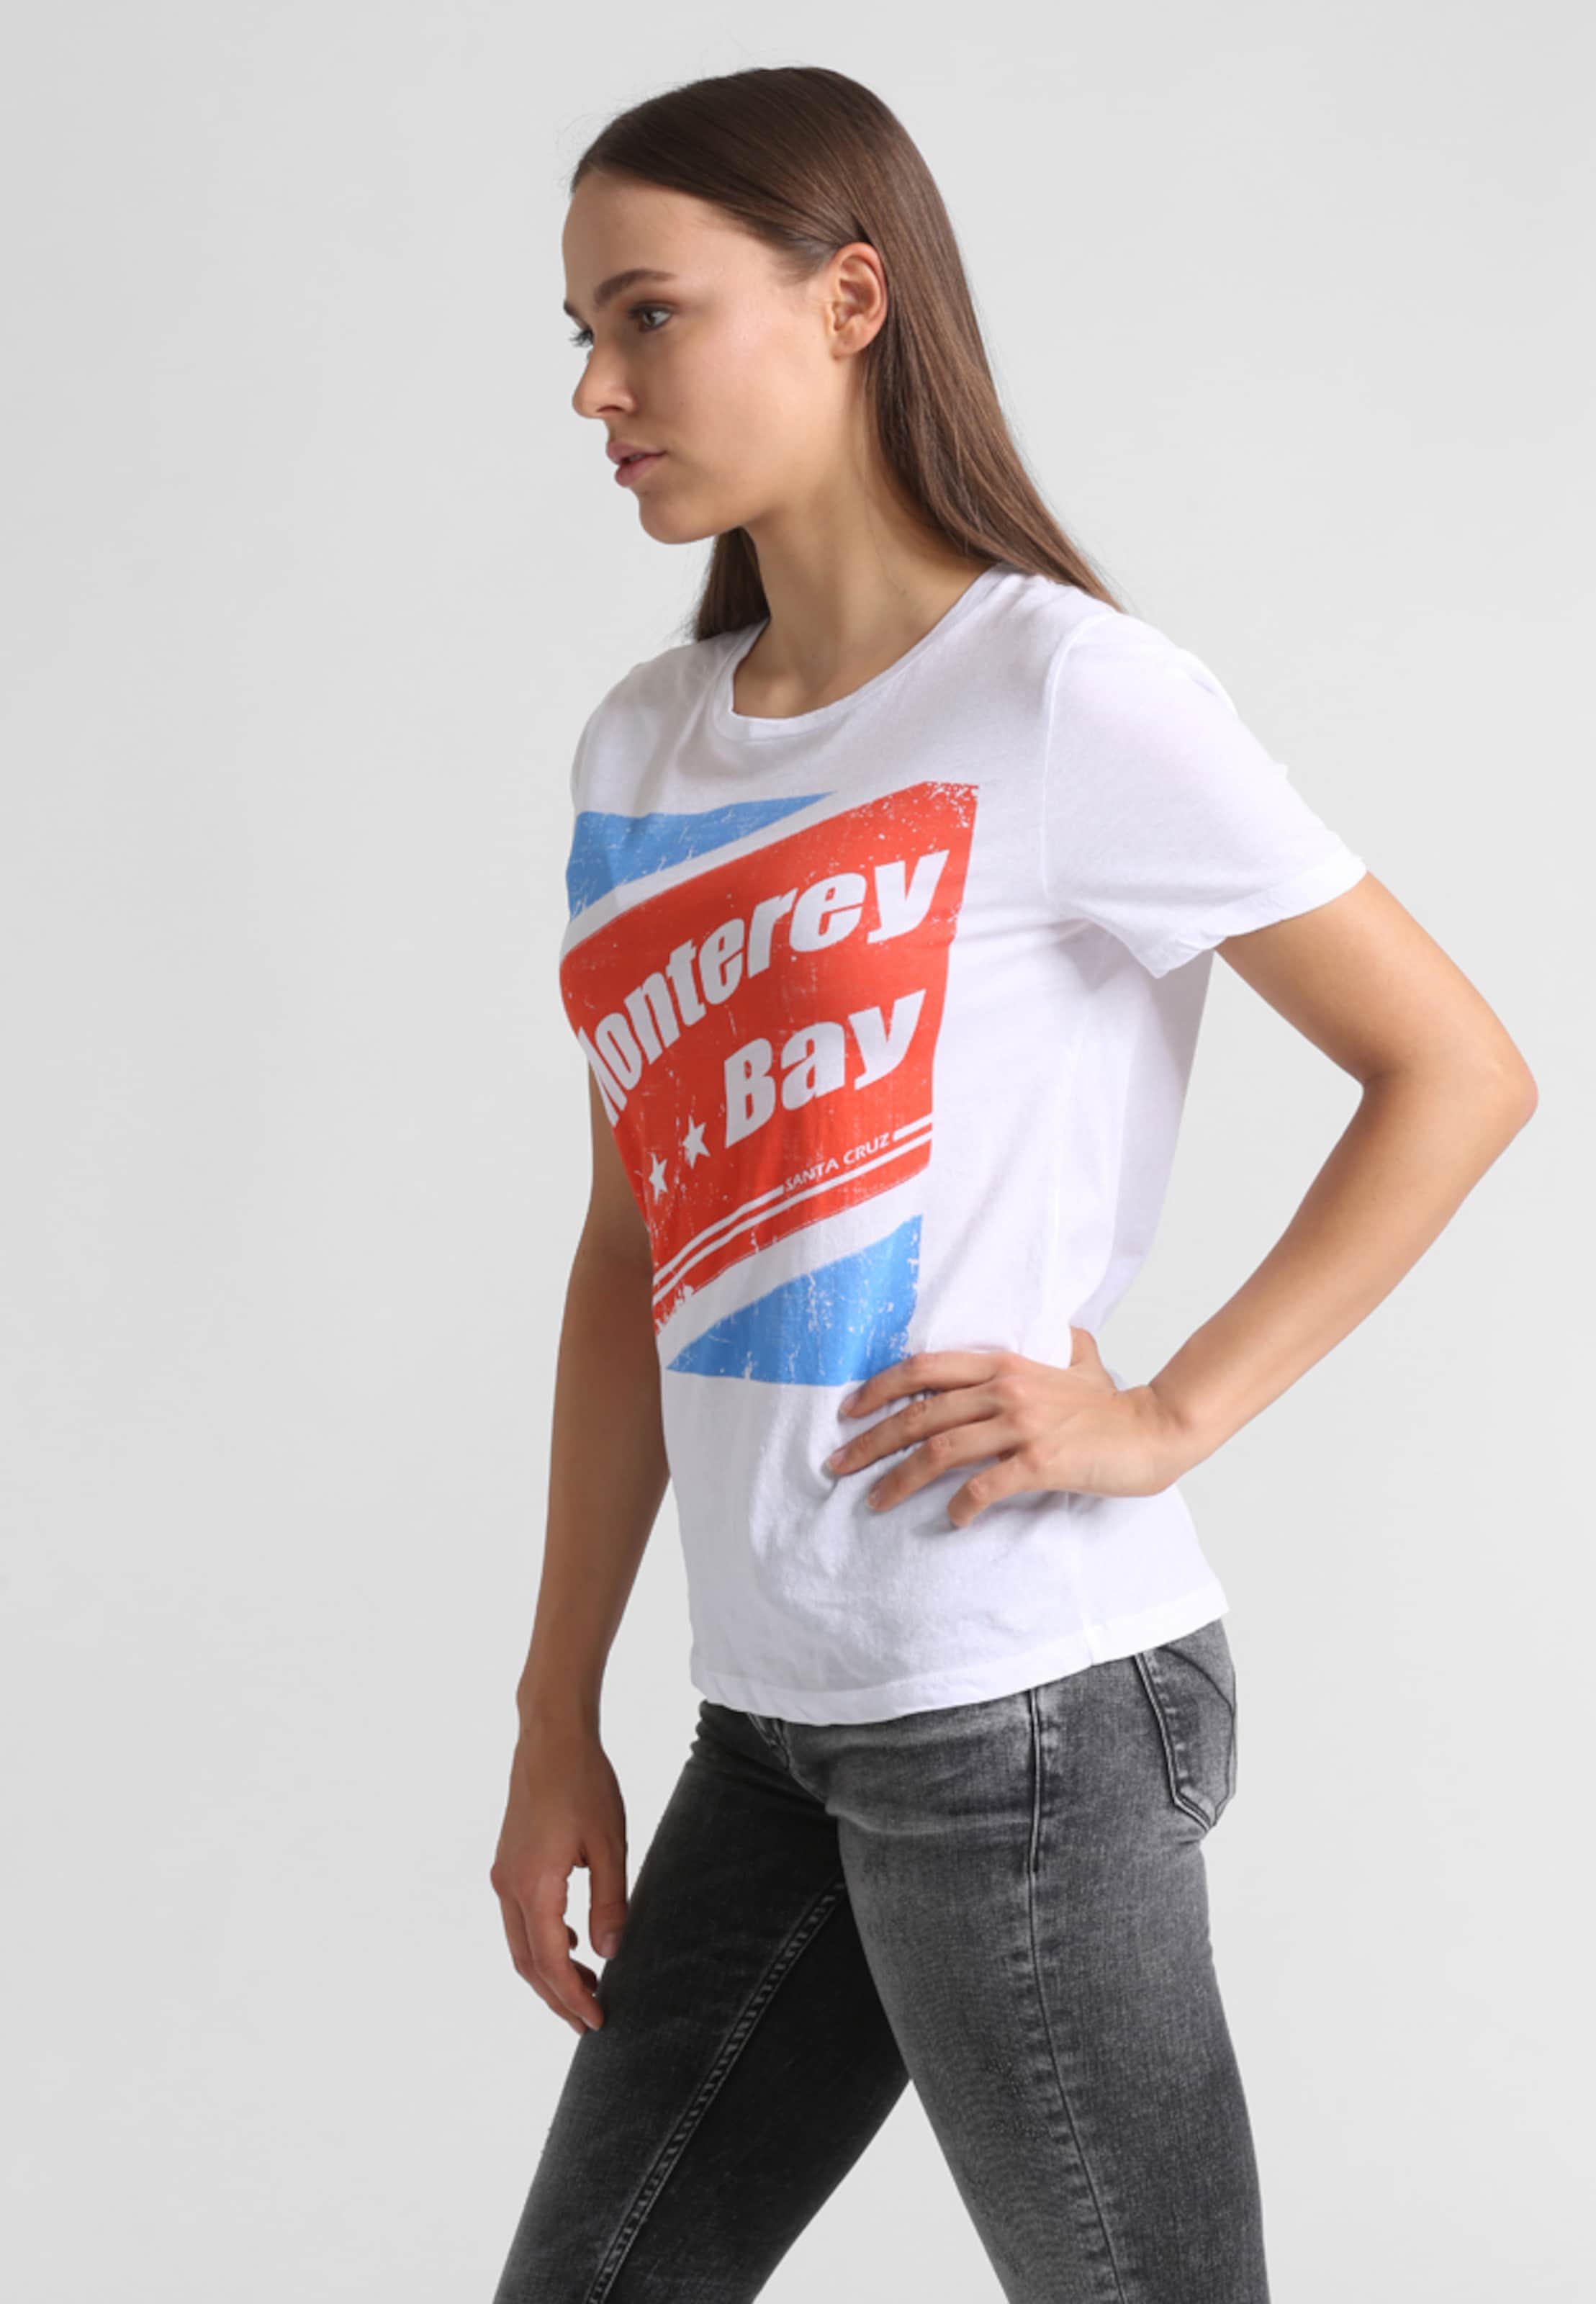 In Retro Set shirt Weiß BlauRot print Mit T DH9EYW2I